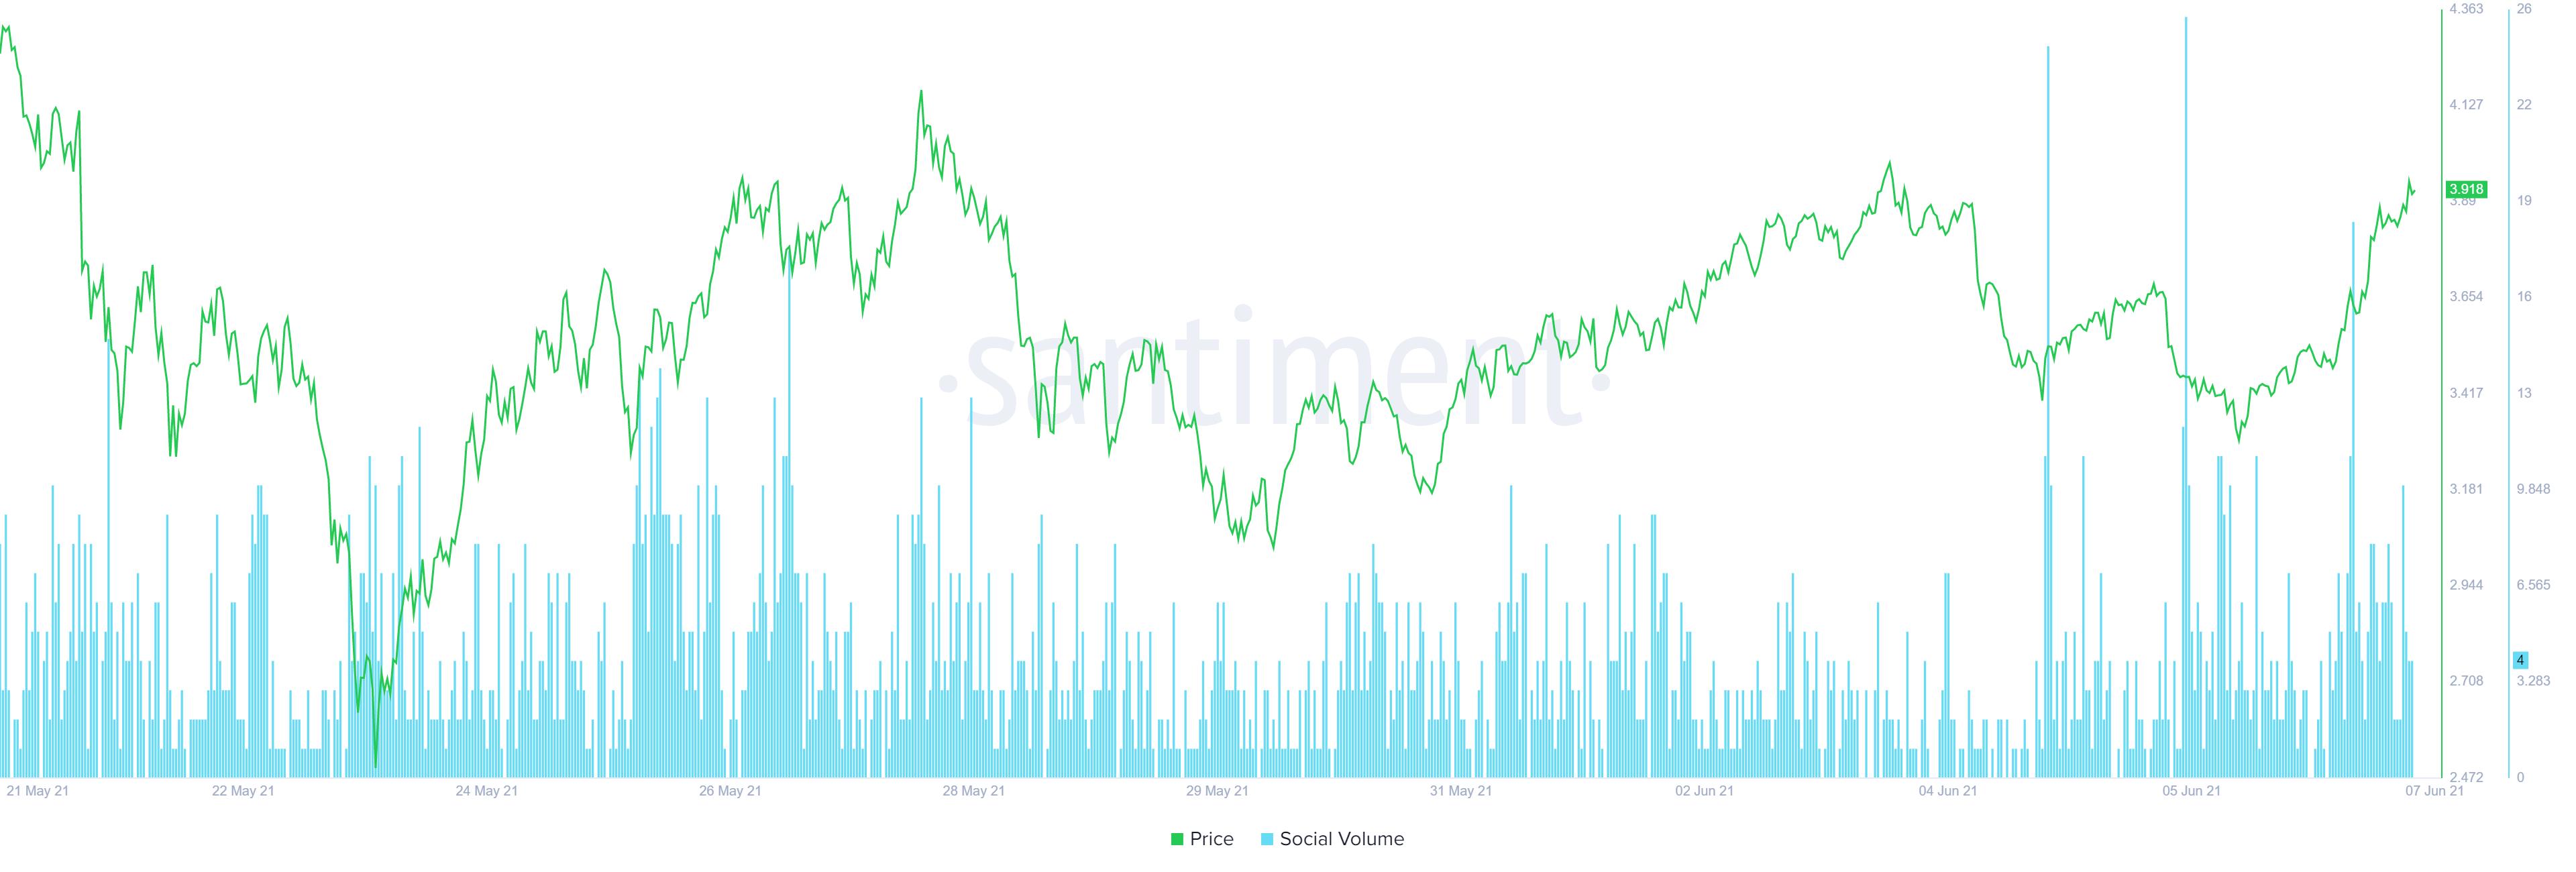 XTZ social volume chart